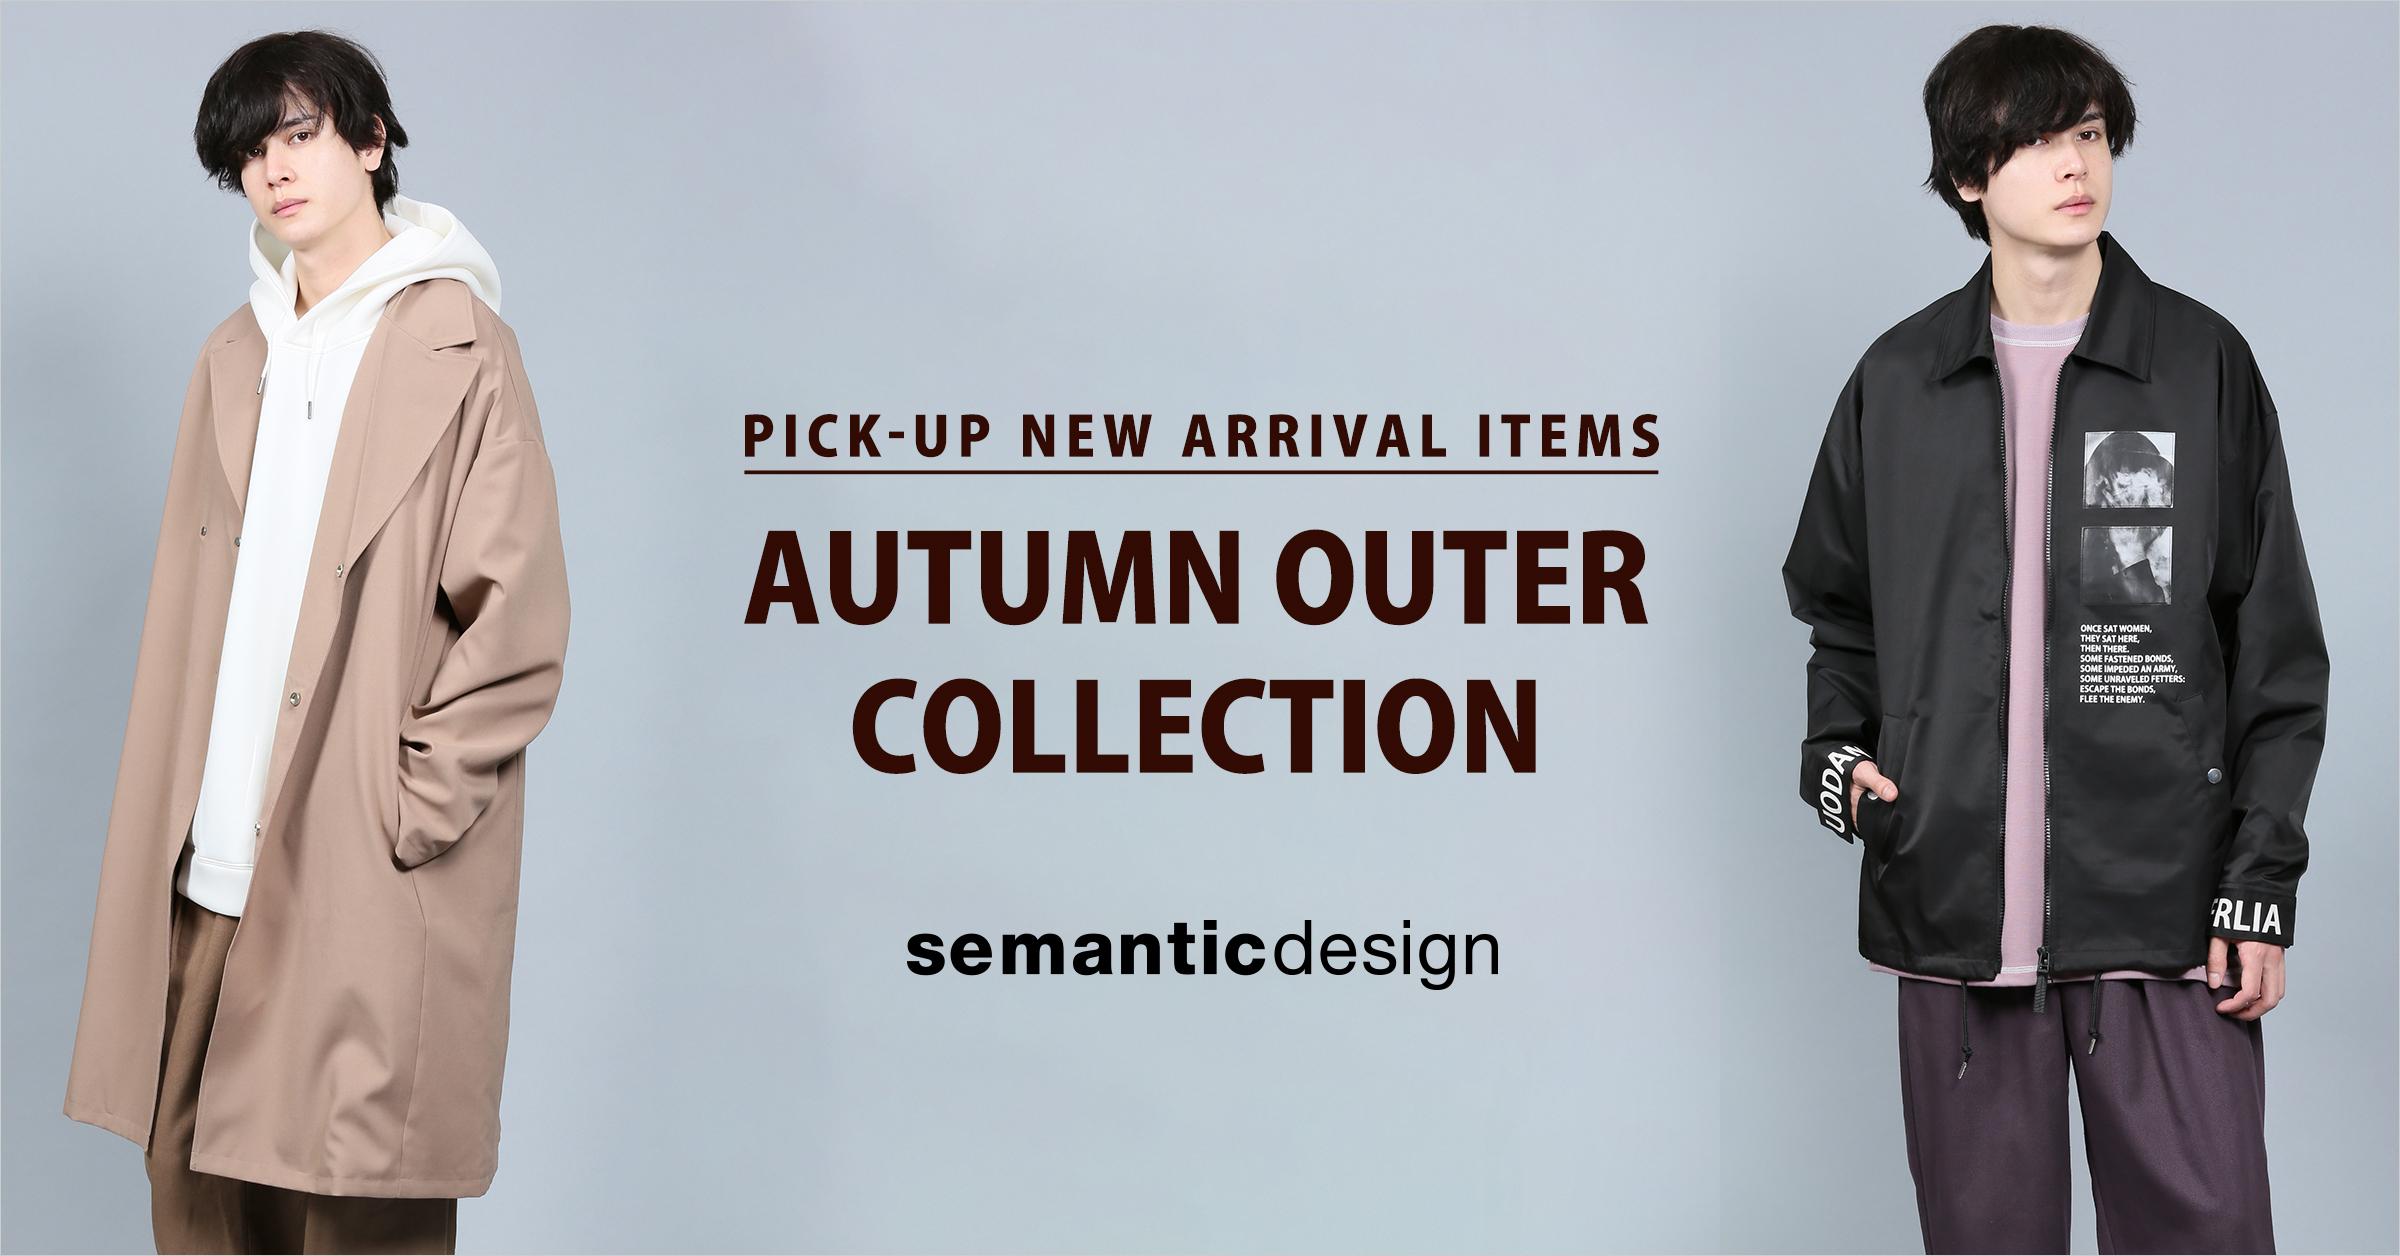 semanticdesign(セマンティックデザイン) AUTUMN OUTER COLLECTION